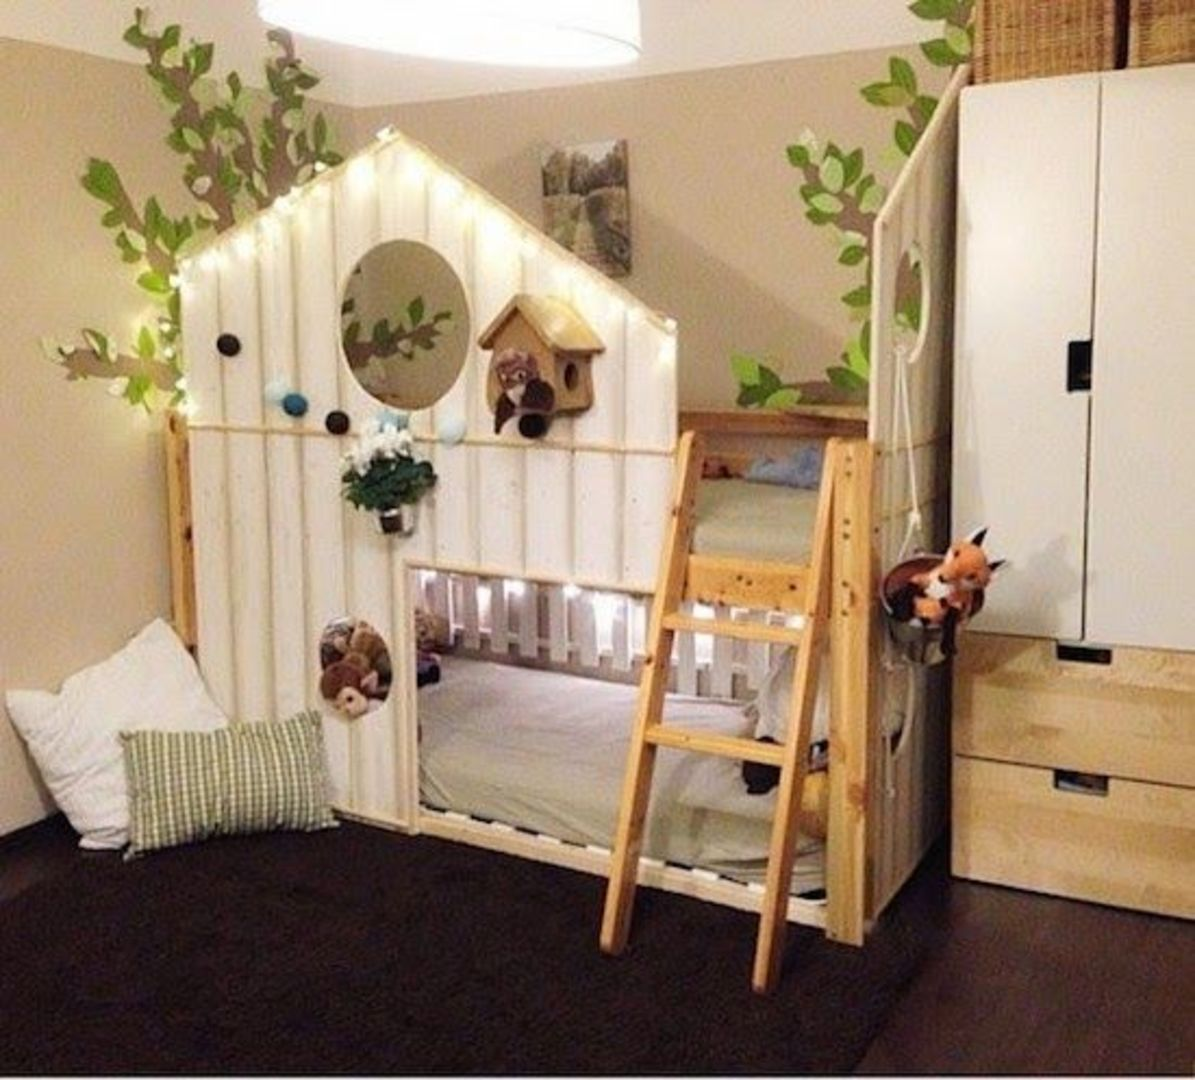 Lit Cabane Customise Recherche Google Chambre Enfant Deco Chambre Enfant Idee Chambre Enfant